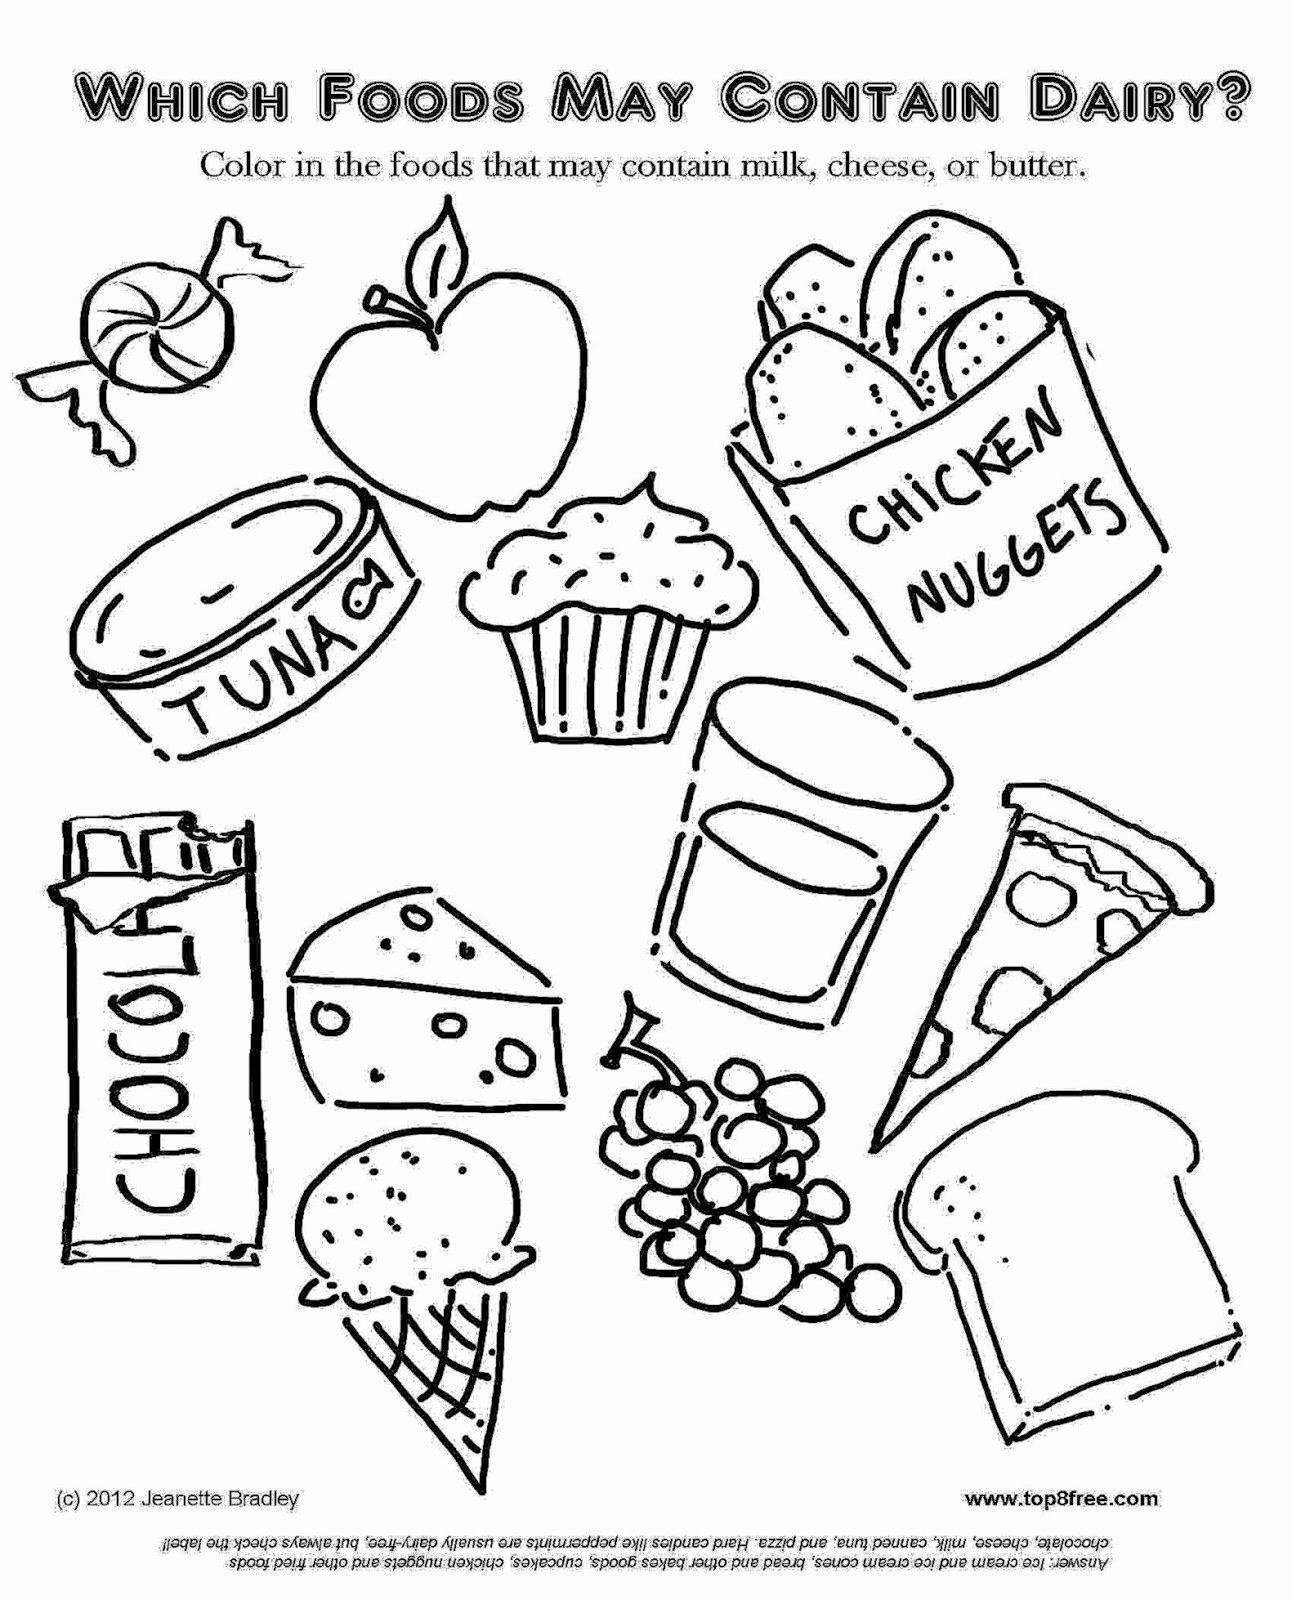 Food Worksheets for Preschoolers Fresh Healthy Foods for Kids Coloring Cooking Worksheets Printable